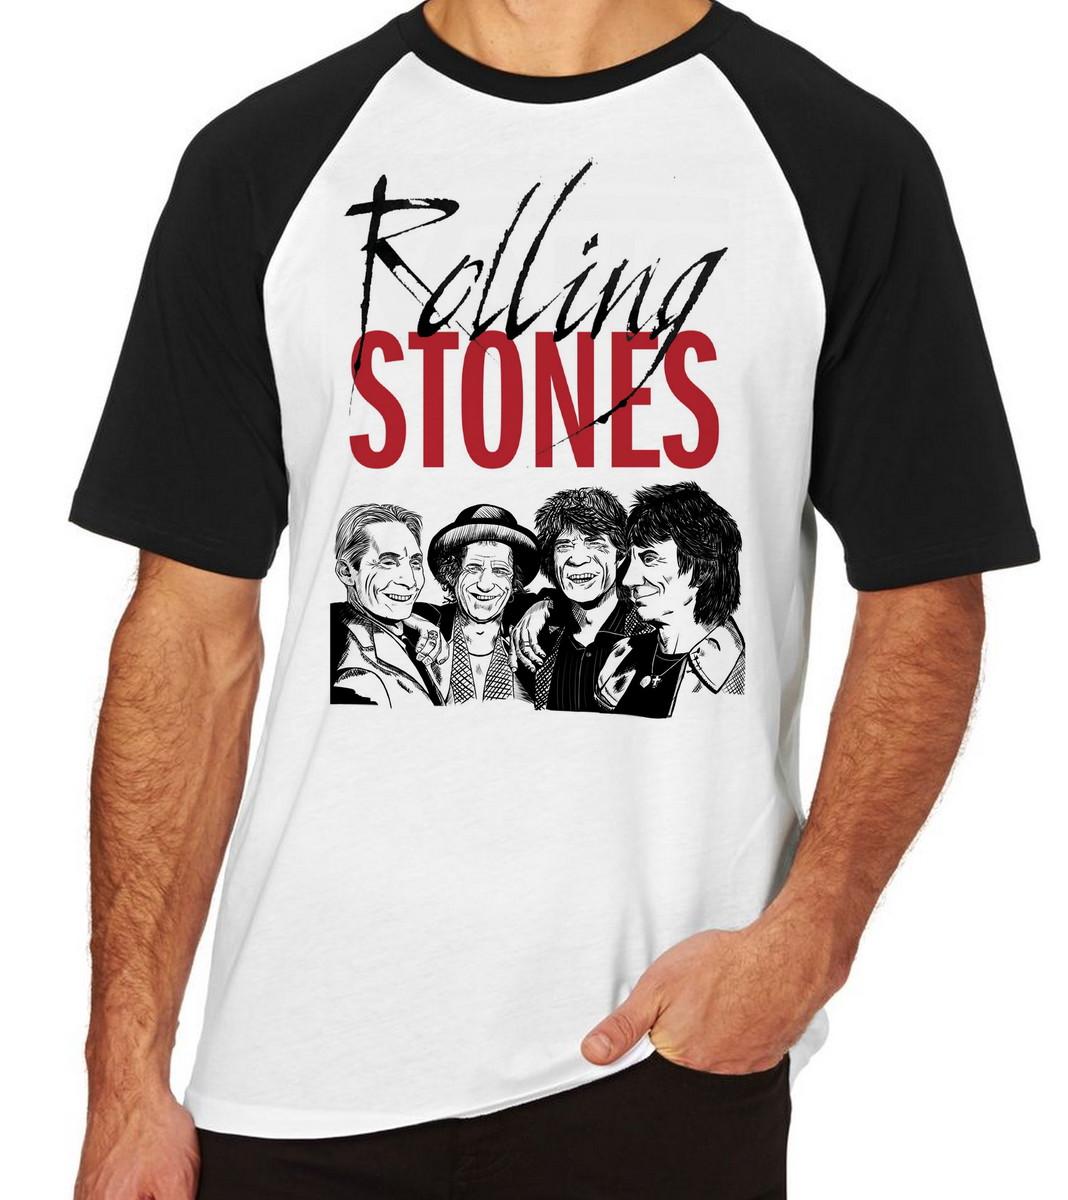 cb1daa2080 Camiseta Raglan Camisa Blusa rolling stone mick jagger Banda no Elo7 ...